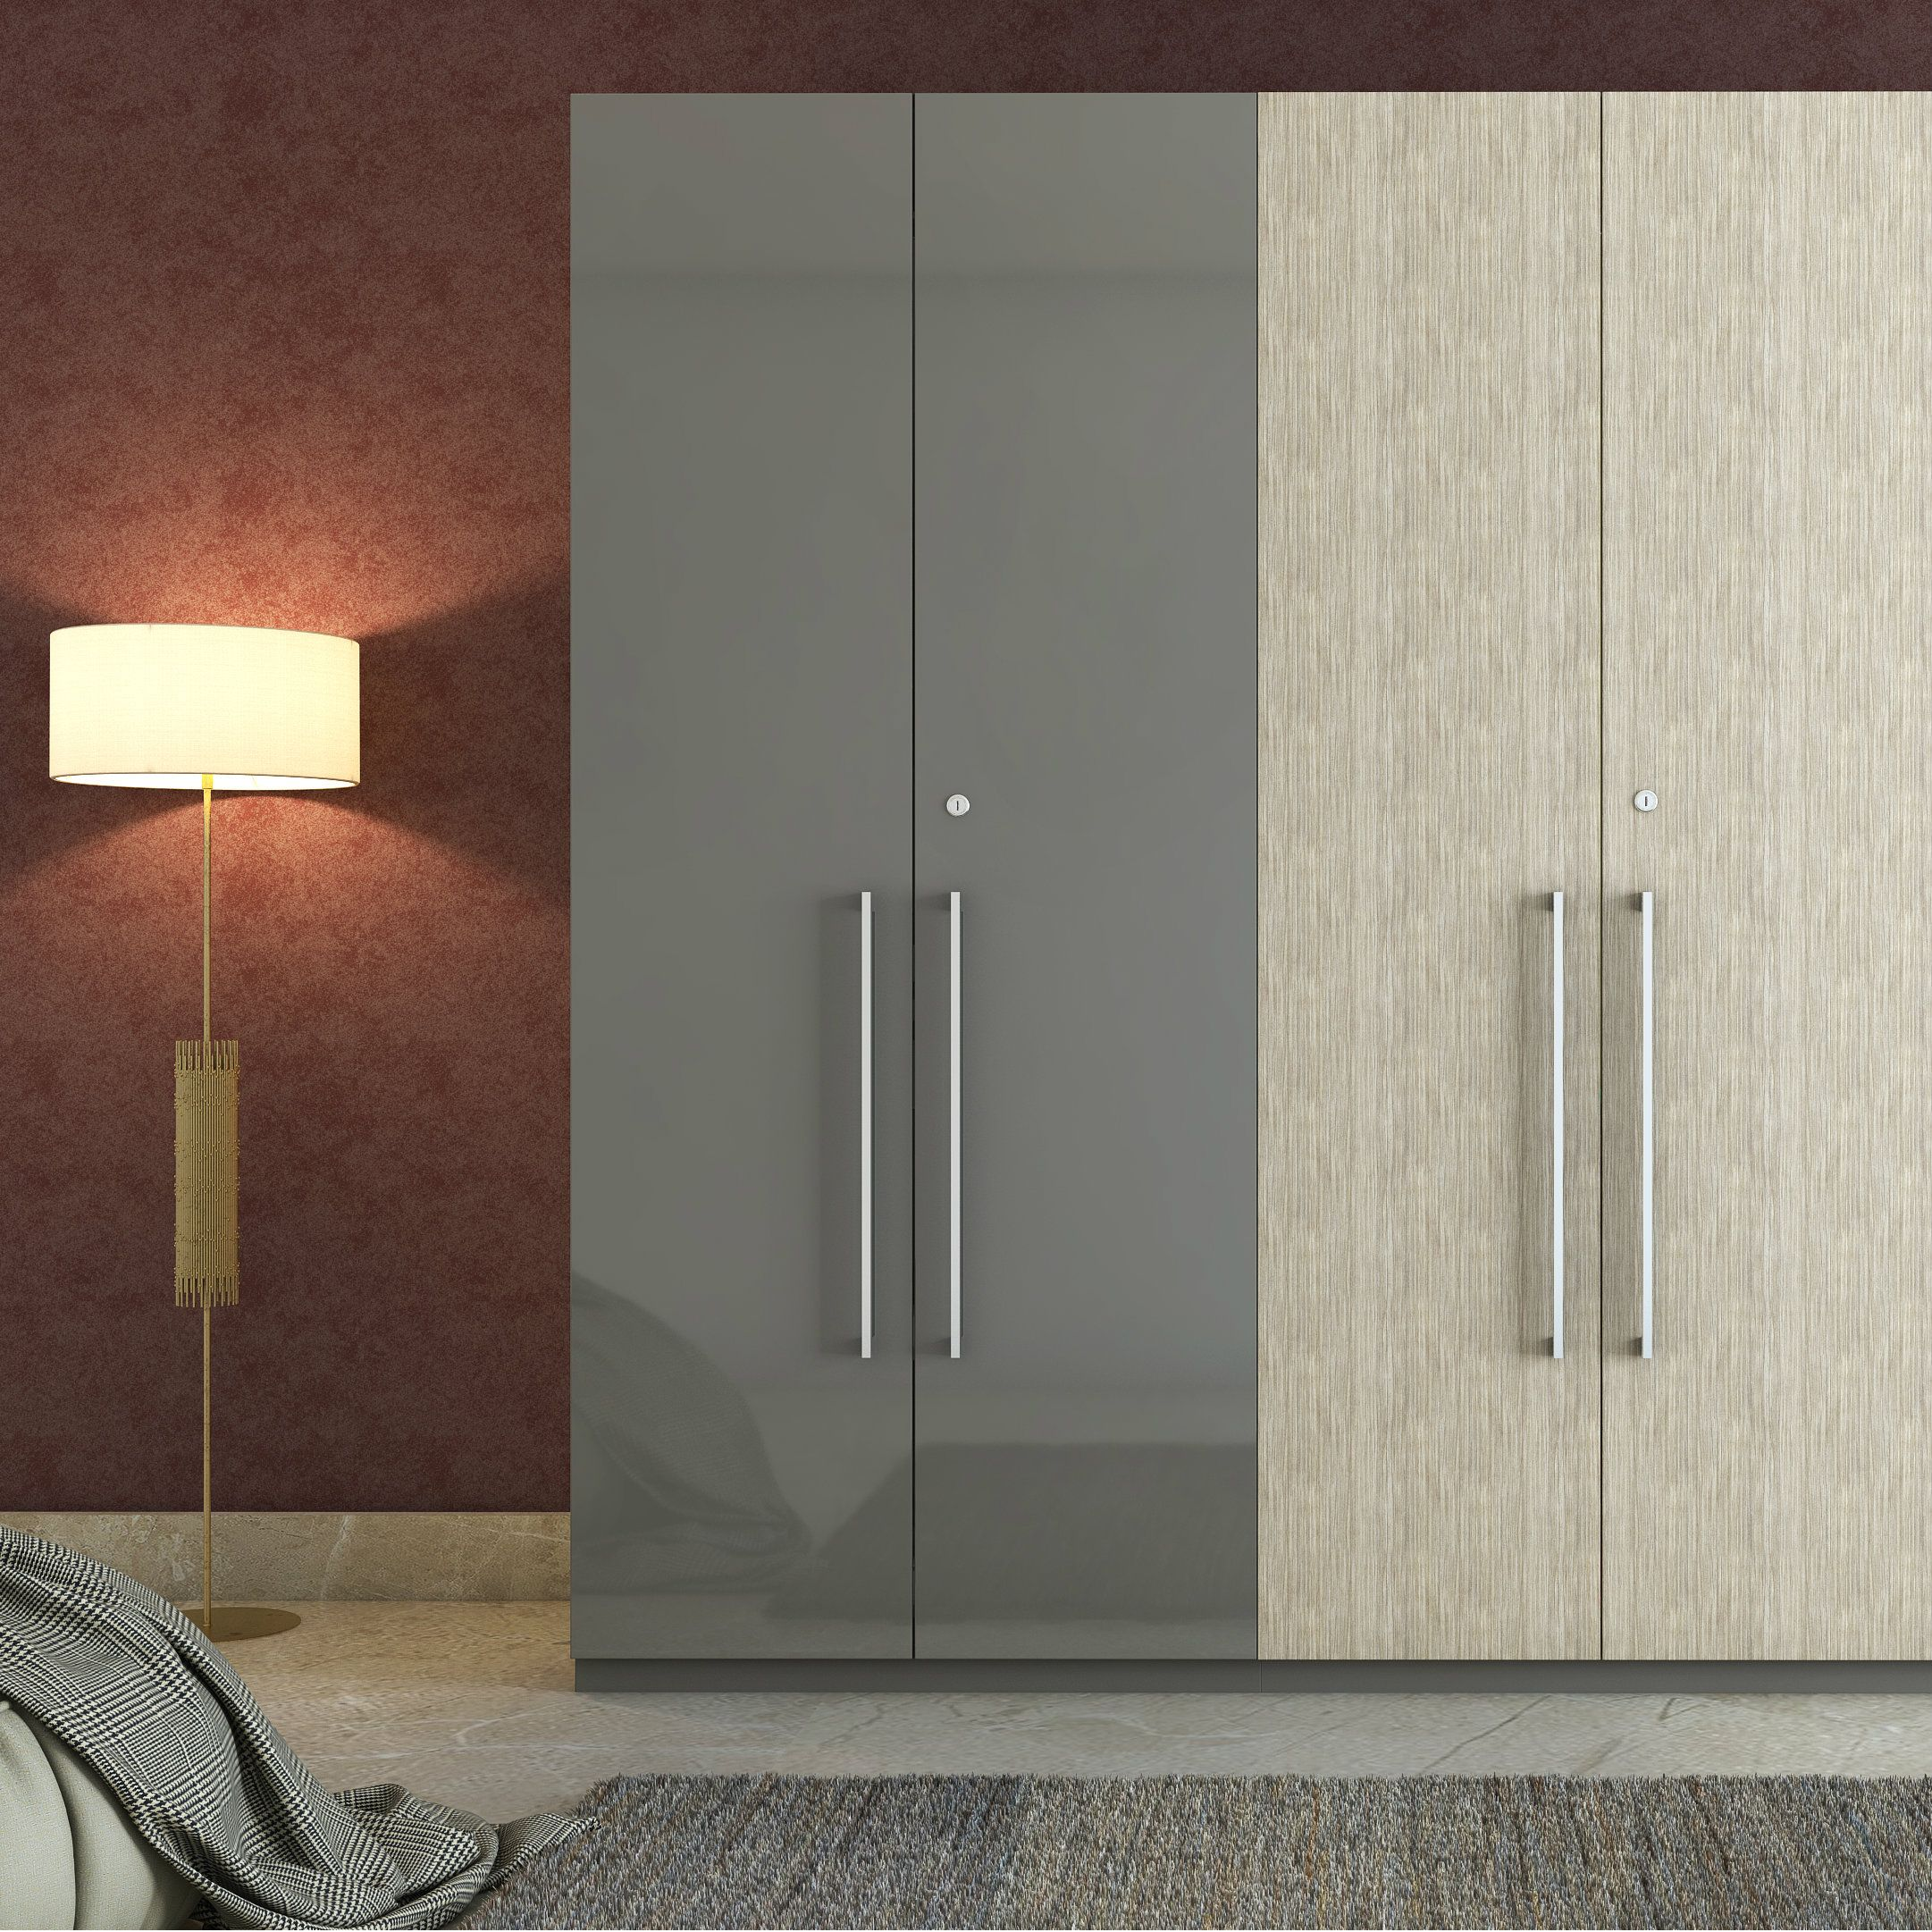 A dual tone swing door wardrobe for segregating your essentials